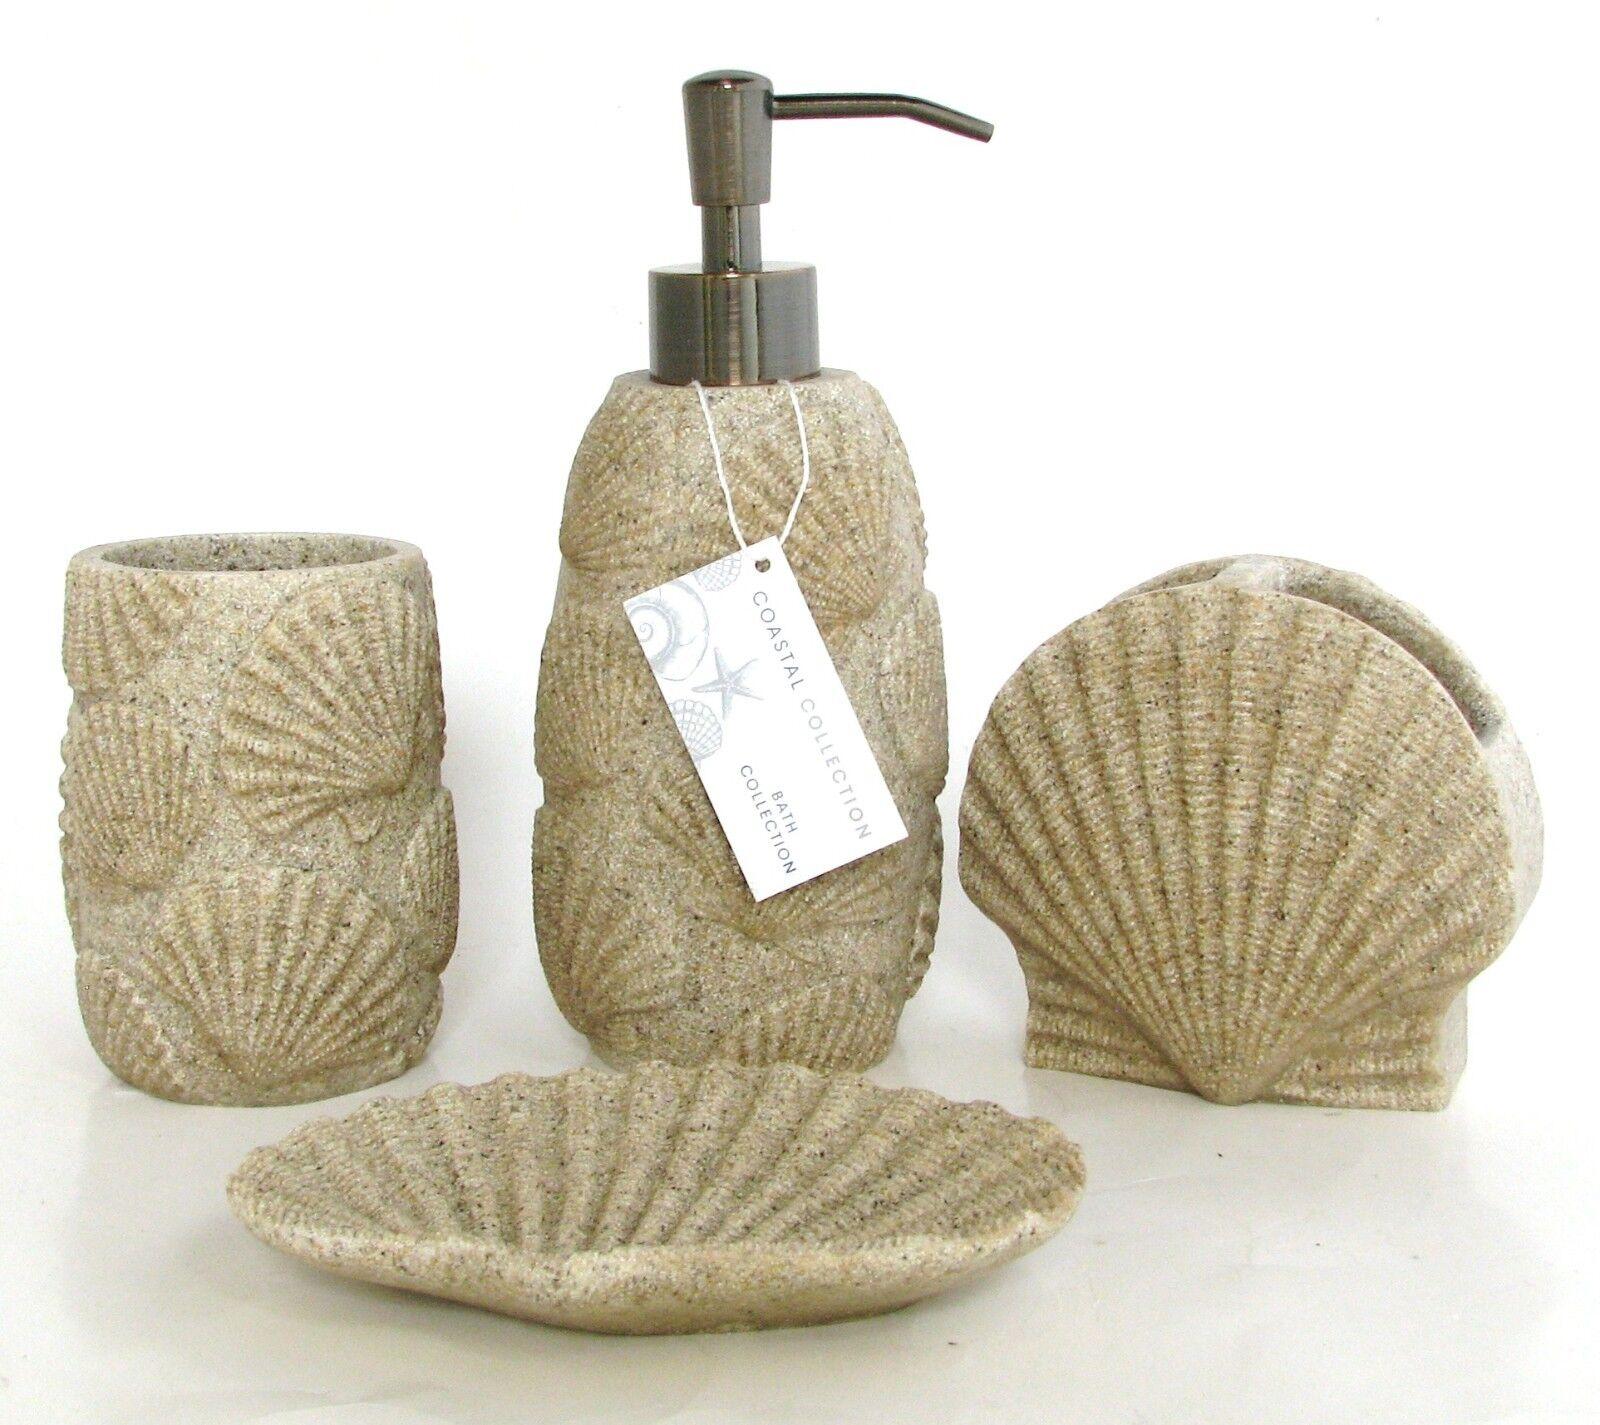 COASTAL COLLECTION 4PC SET SAND BEIGE+CLAM SHELL BEACH SOAP DISPENSER+DISH+2MORE